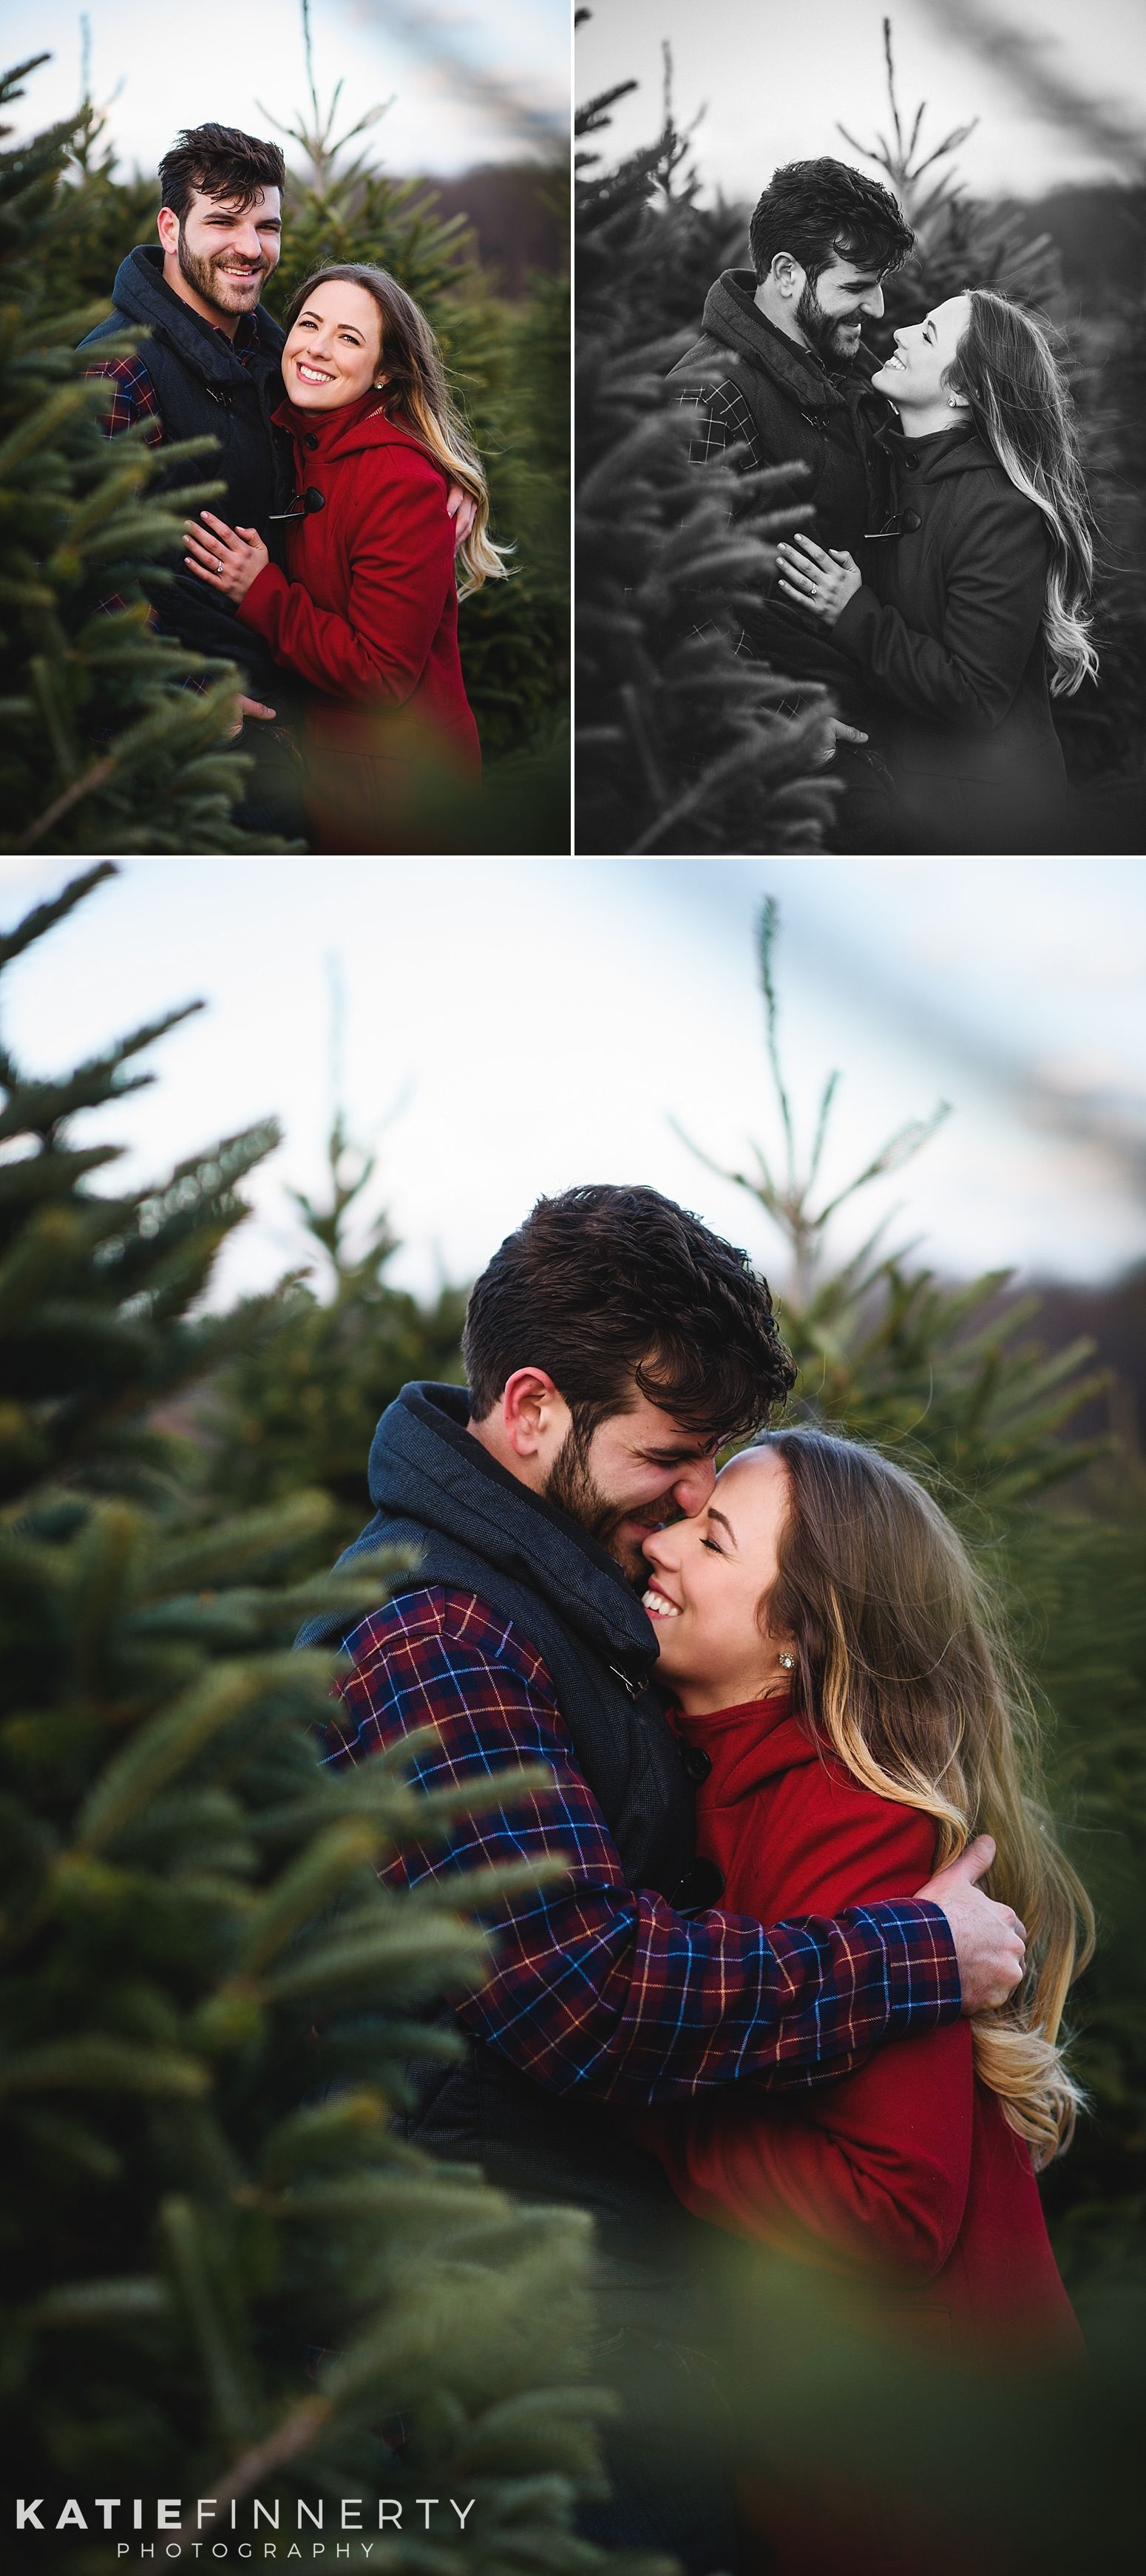 Weihnachtsbaumfarm Verlobungssitzung Paulina Nick Rochester Buff Christmas Tree Farm Photo Shoot Christmas Tree Farm Pictures Christmas Tree Farm Photos